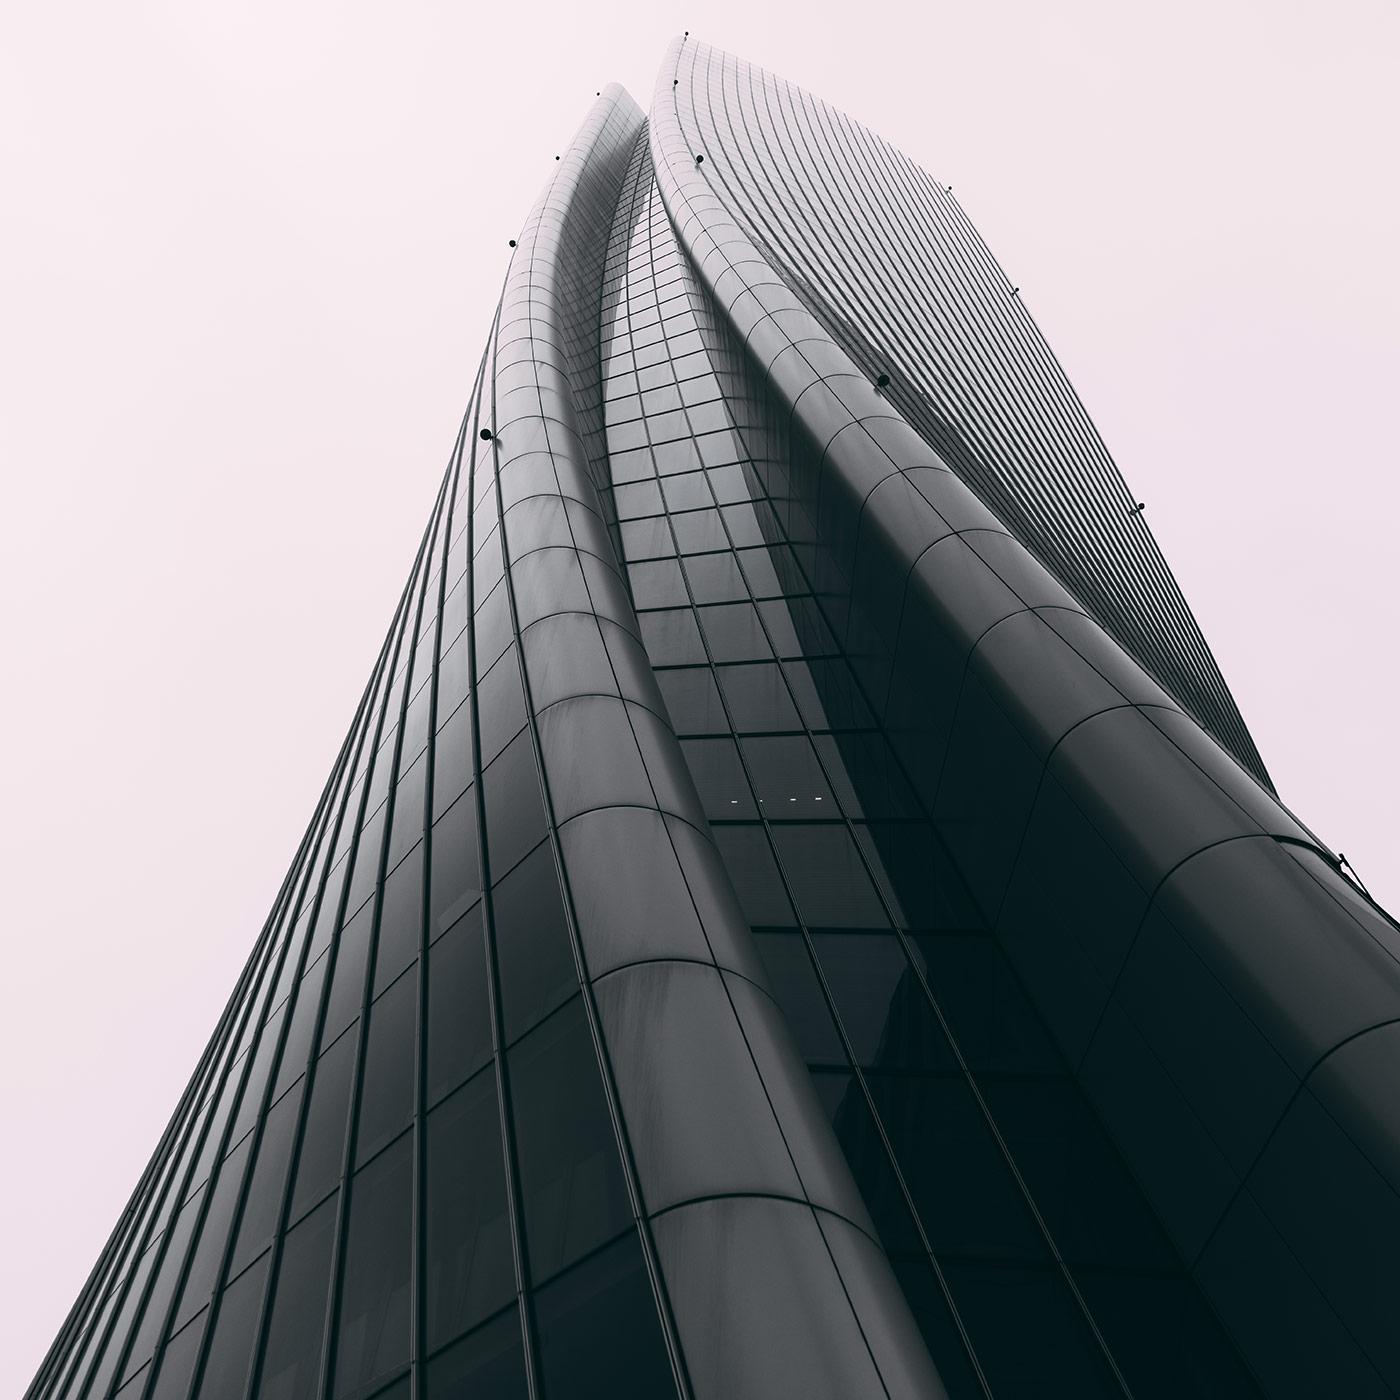 La torre Hadid, CityLife <br />Location: Milan, Italy <br />Architect: Zaha Hadid